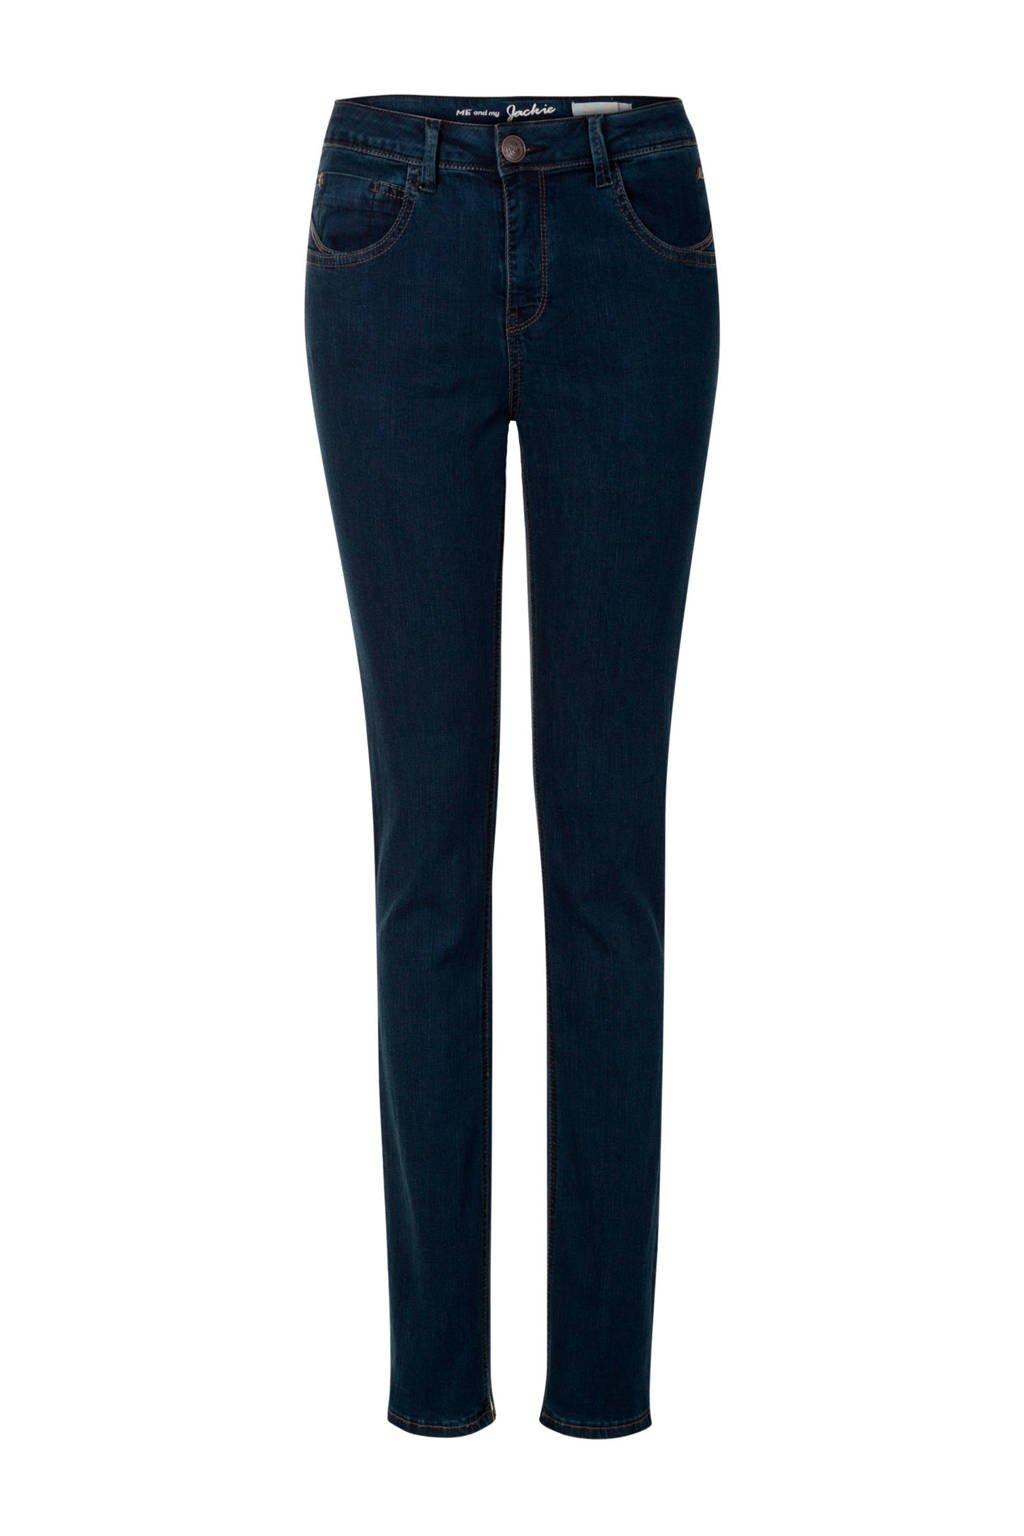 Miss Etam Regulier straight jeans Jackie 36 inch, Blauw